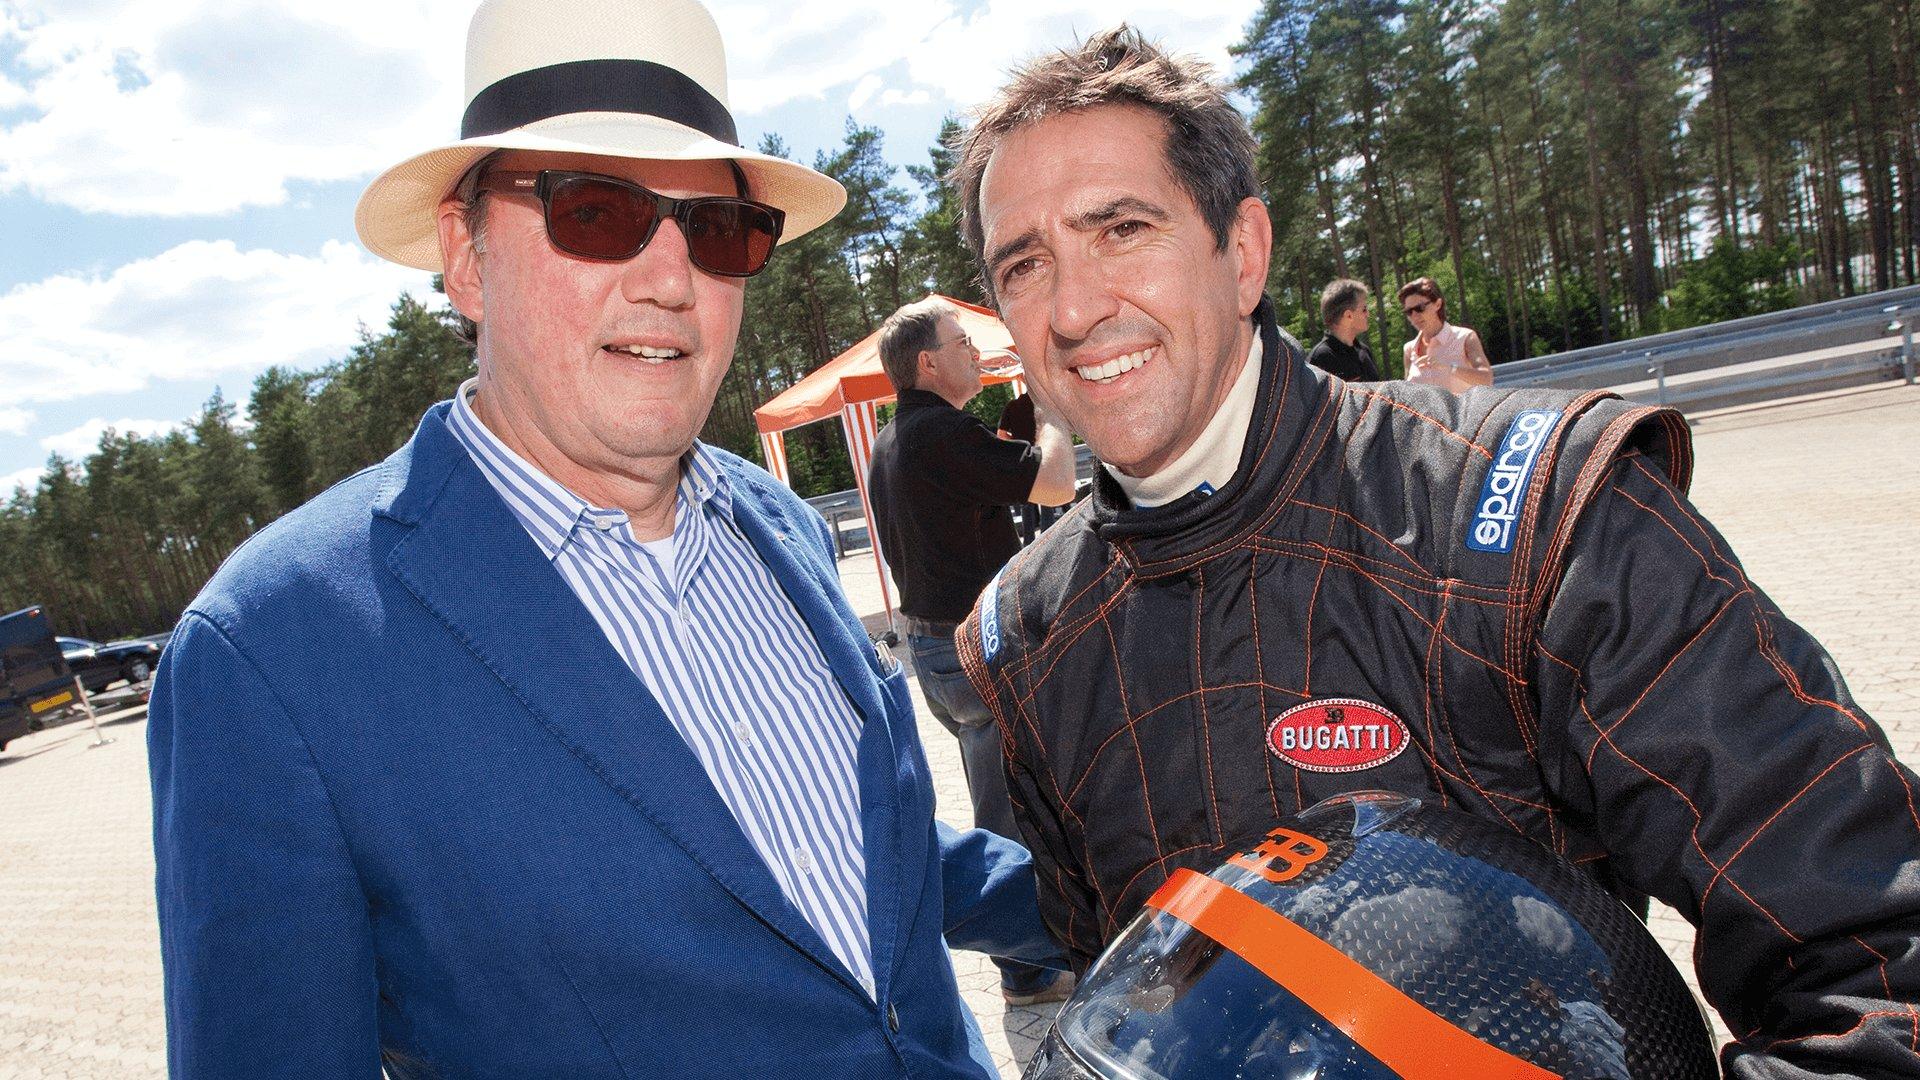 Pierre-Henri RaphanelPierre-Henri Raphanel Bugatti Veyron Super Sport recordaPierre-Henri Raphanel Bugatti Veyron Super Sport record